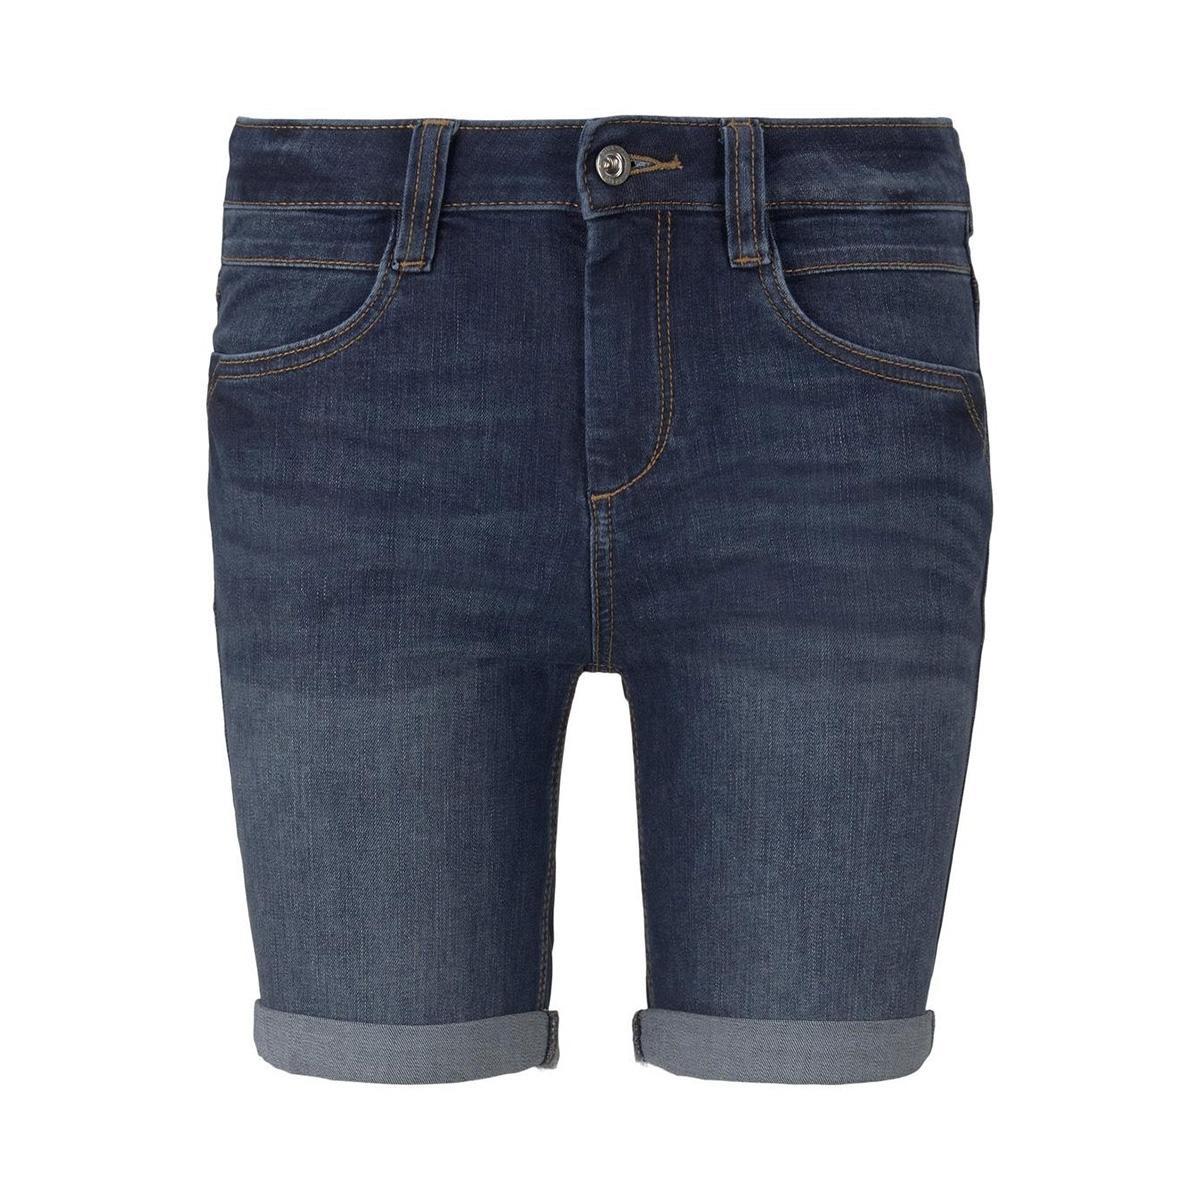 alexa slim bermuda denim shorts 1016820xx70 tom tailor korte broek 10282